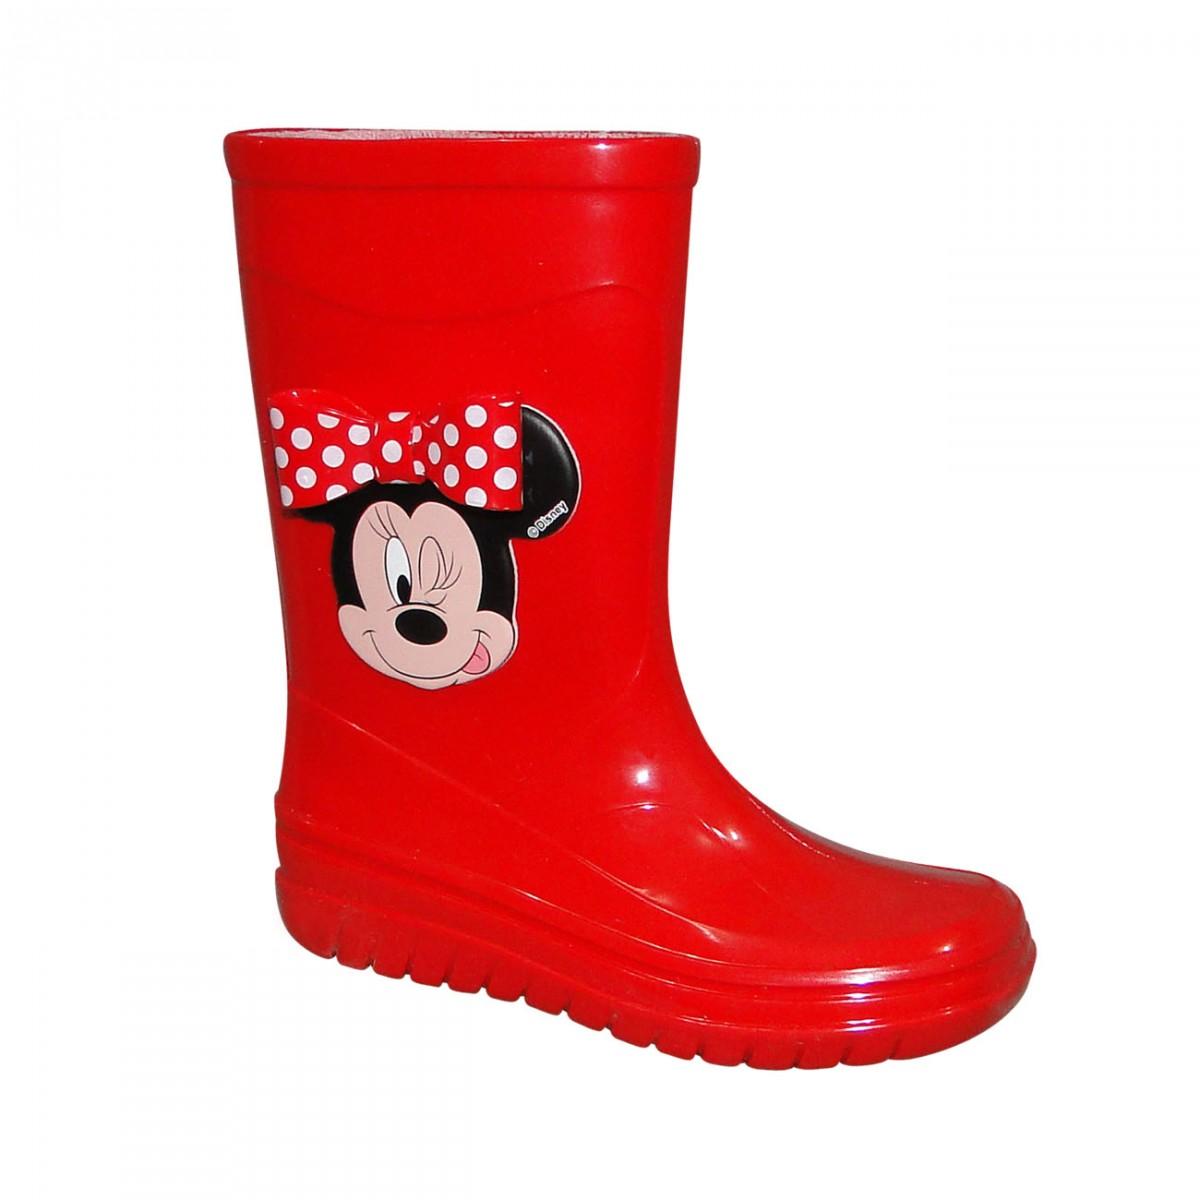 8b10c4a4972 Bota Minie Disney Magia Infantil